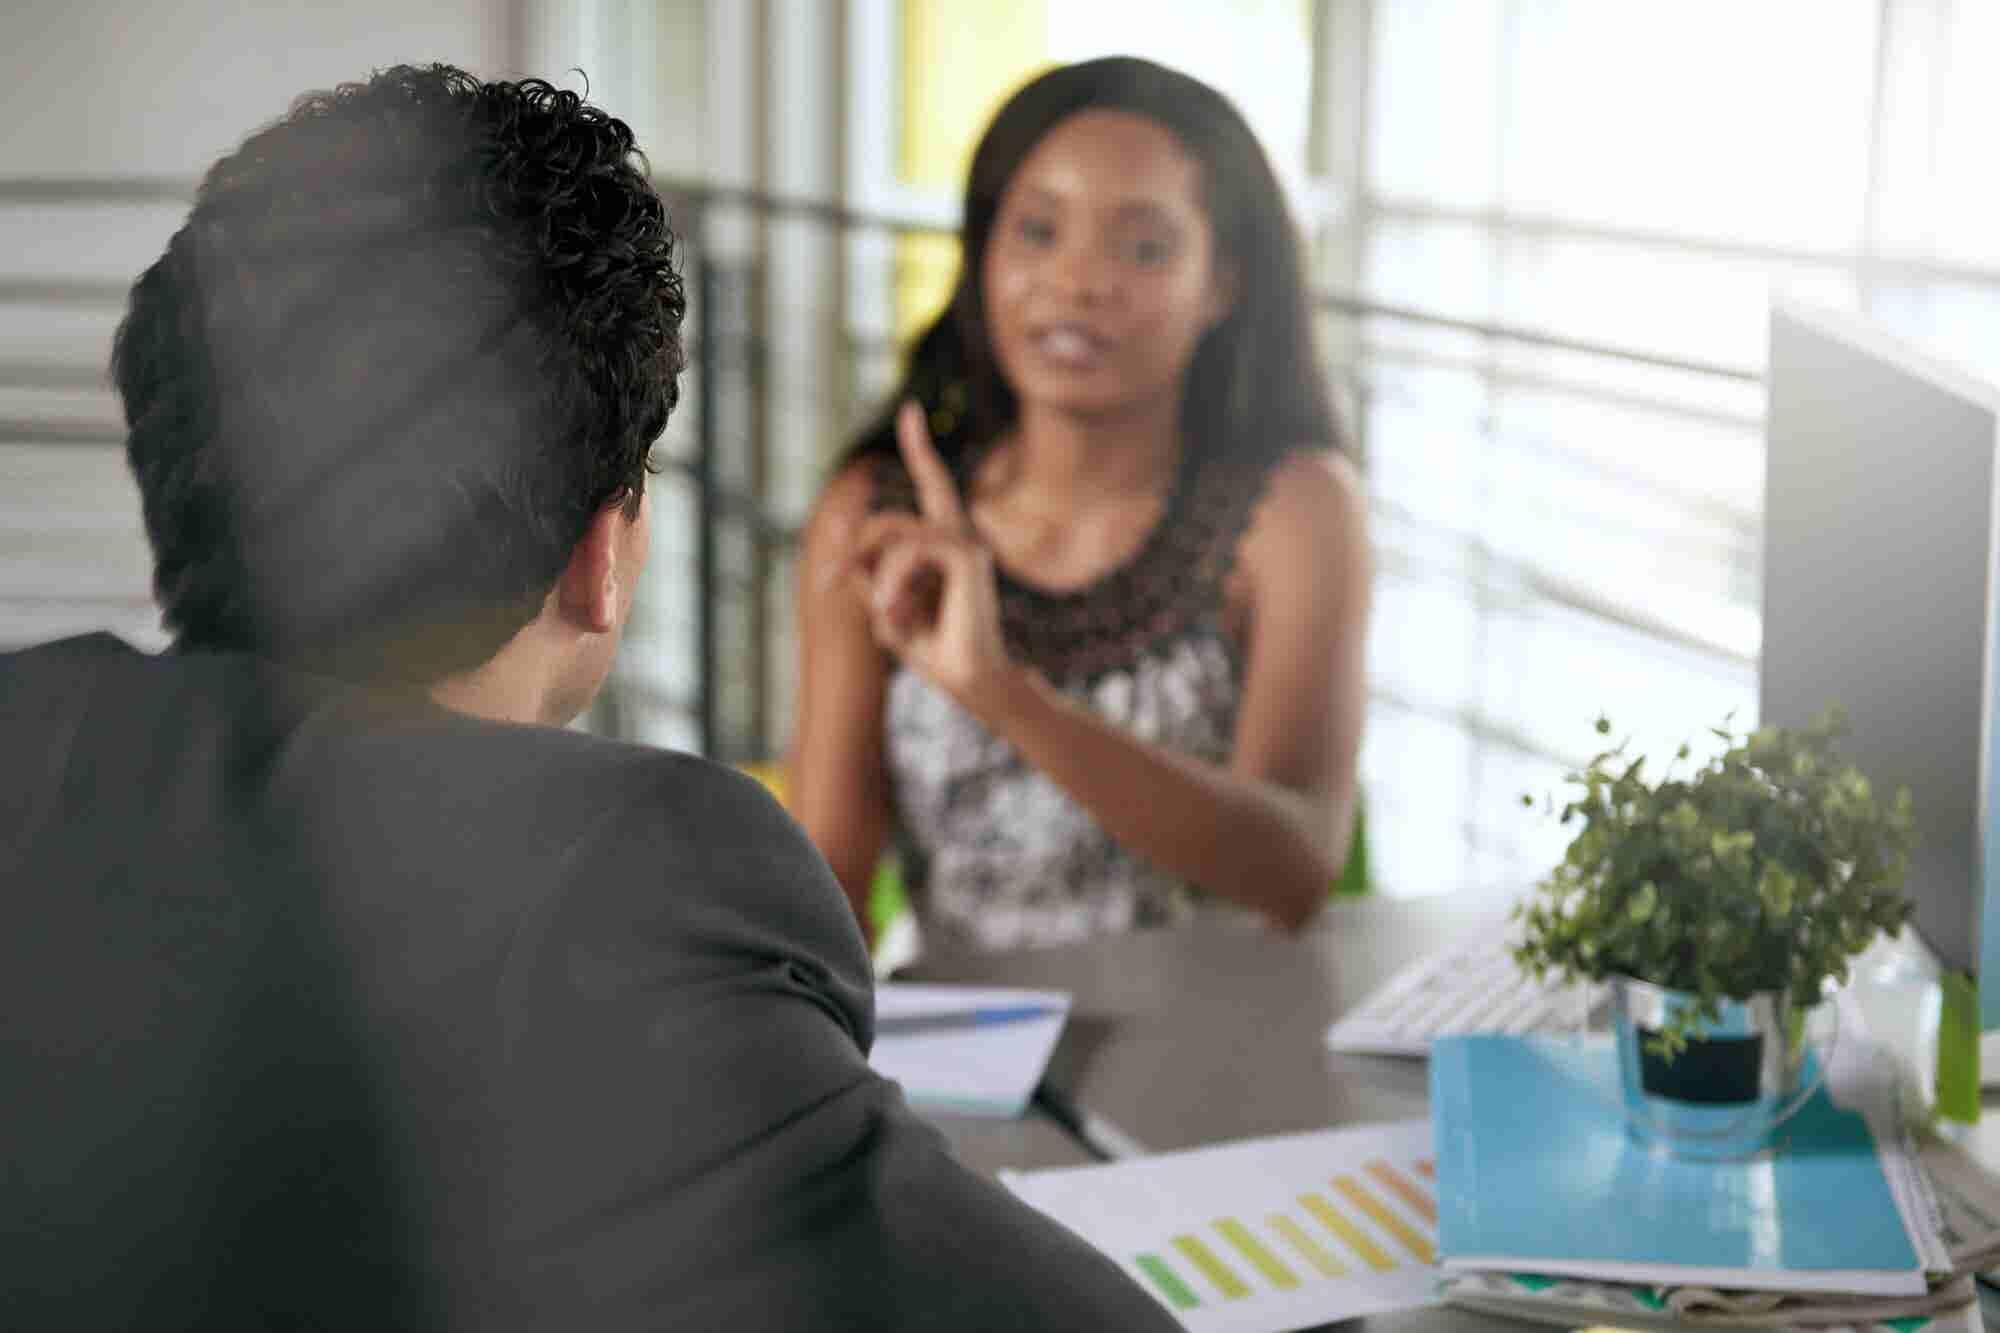 3 Lessons a Toxic Client Taught Me About Entrepreneurship